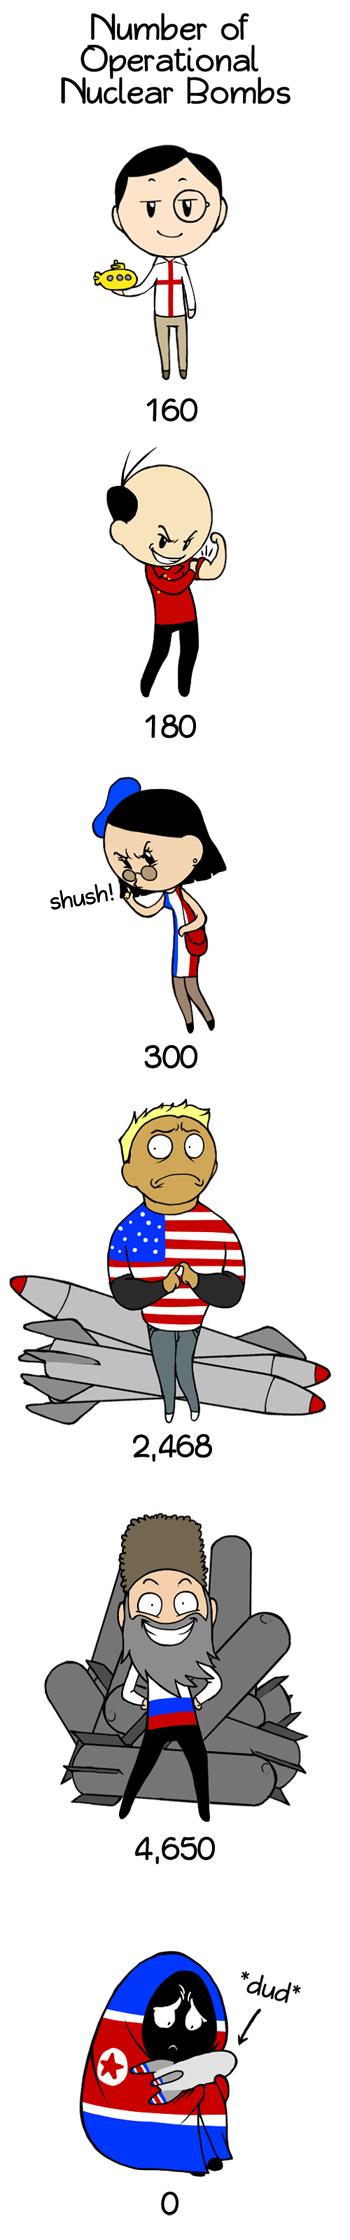 Nuclear Bombs satwcomic.com